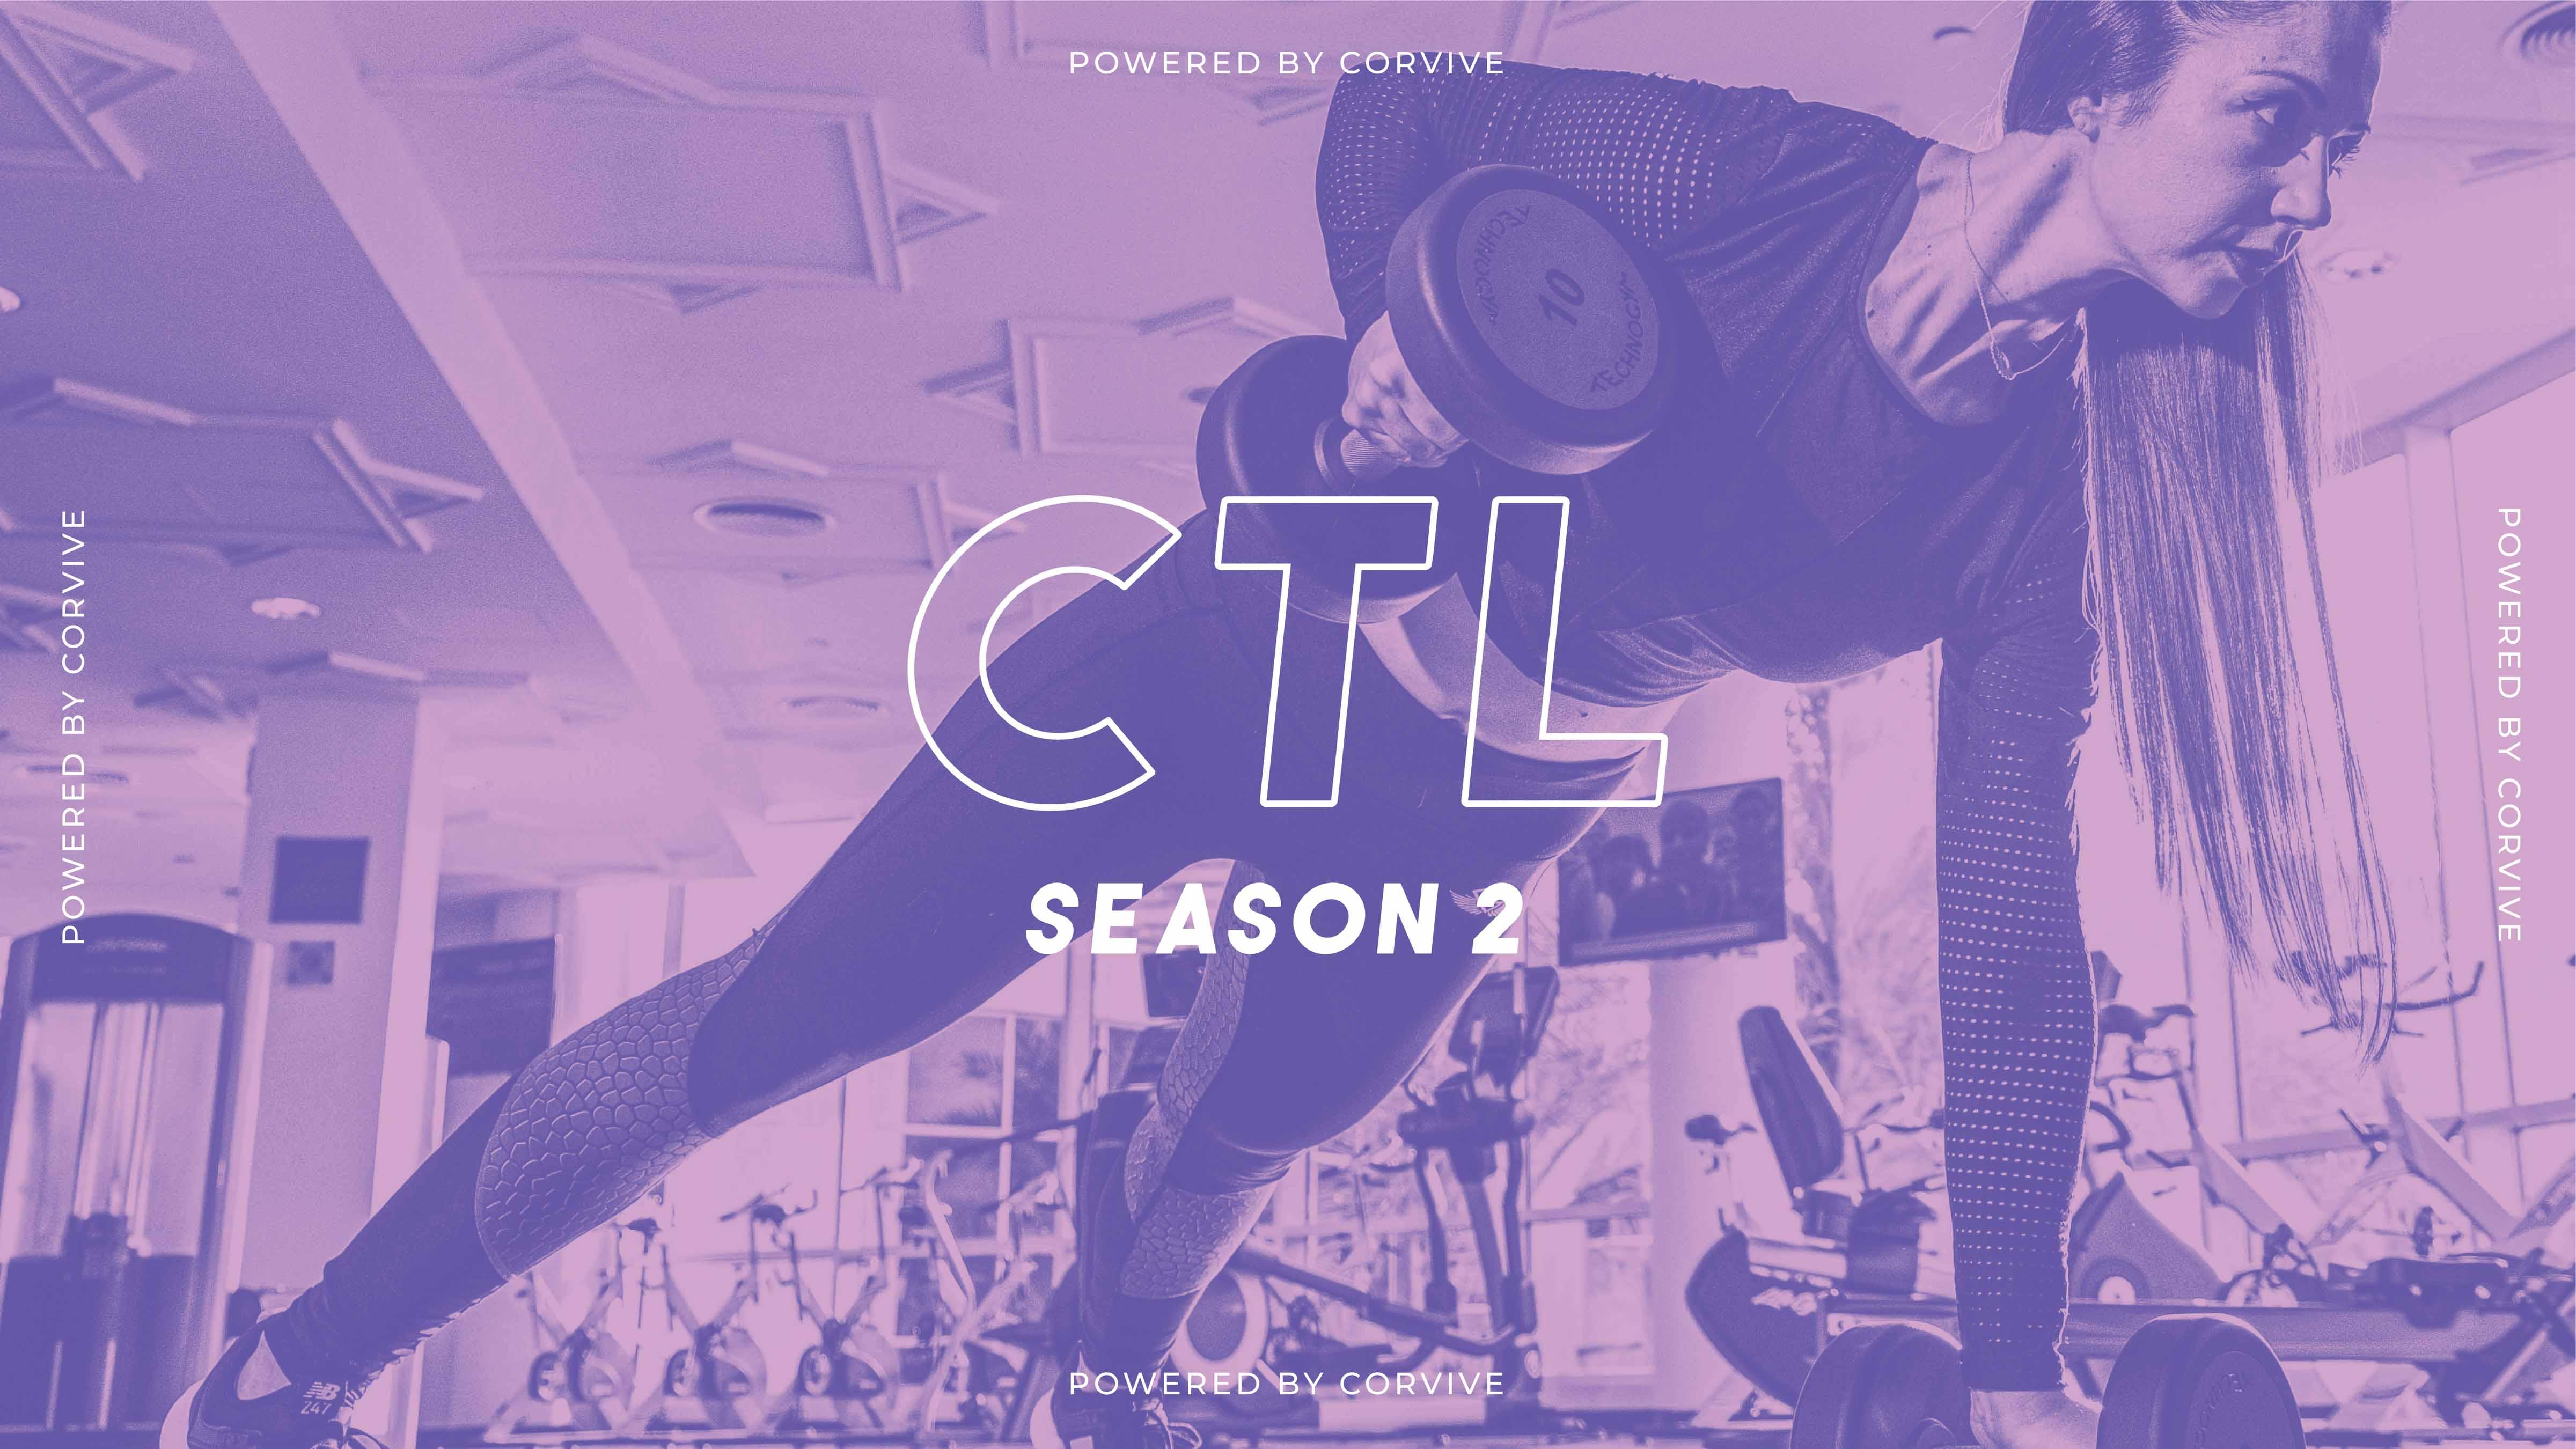 CTL season 2 graphic image